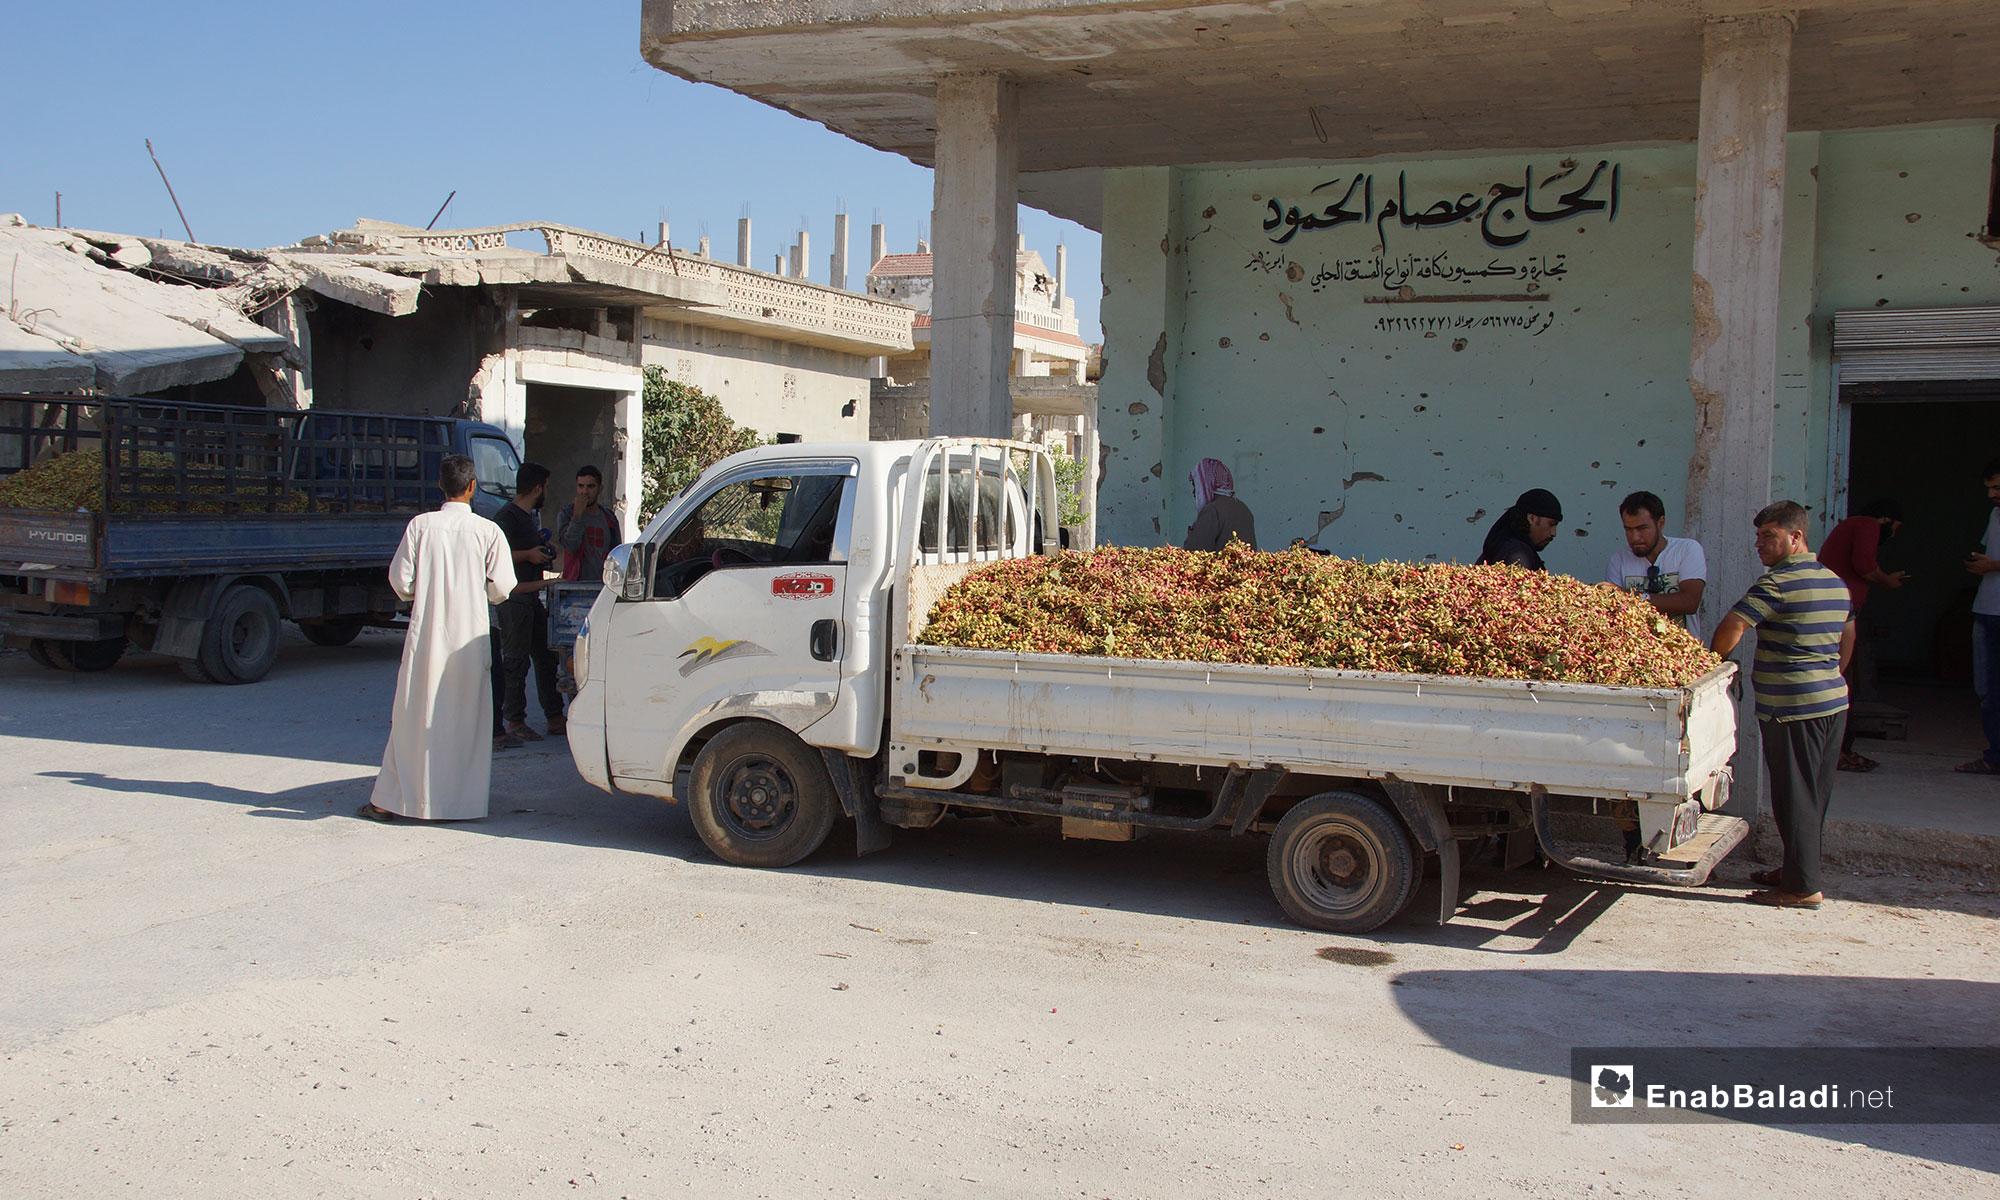 Pistachio market in the city of Murak, rural Hama- July 28, 2018 (Enab Baladi)